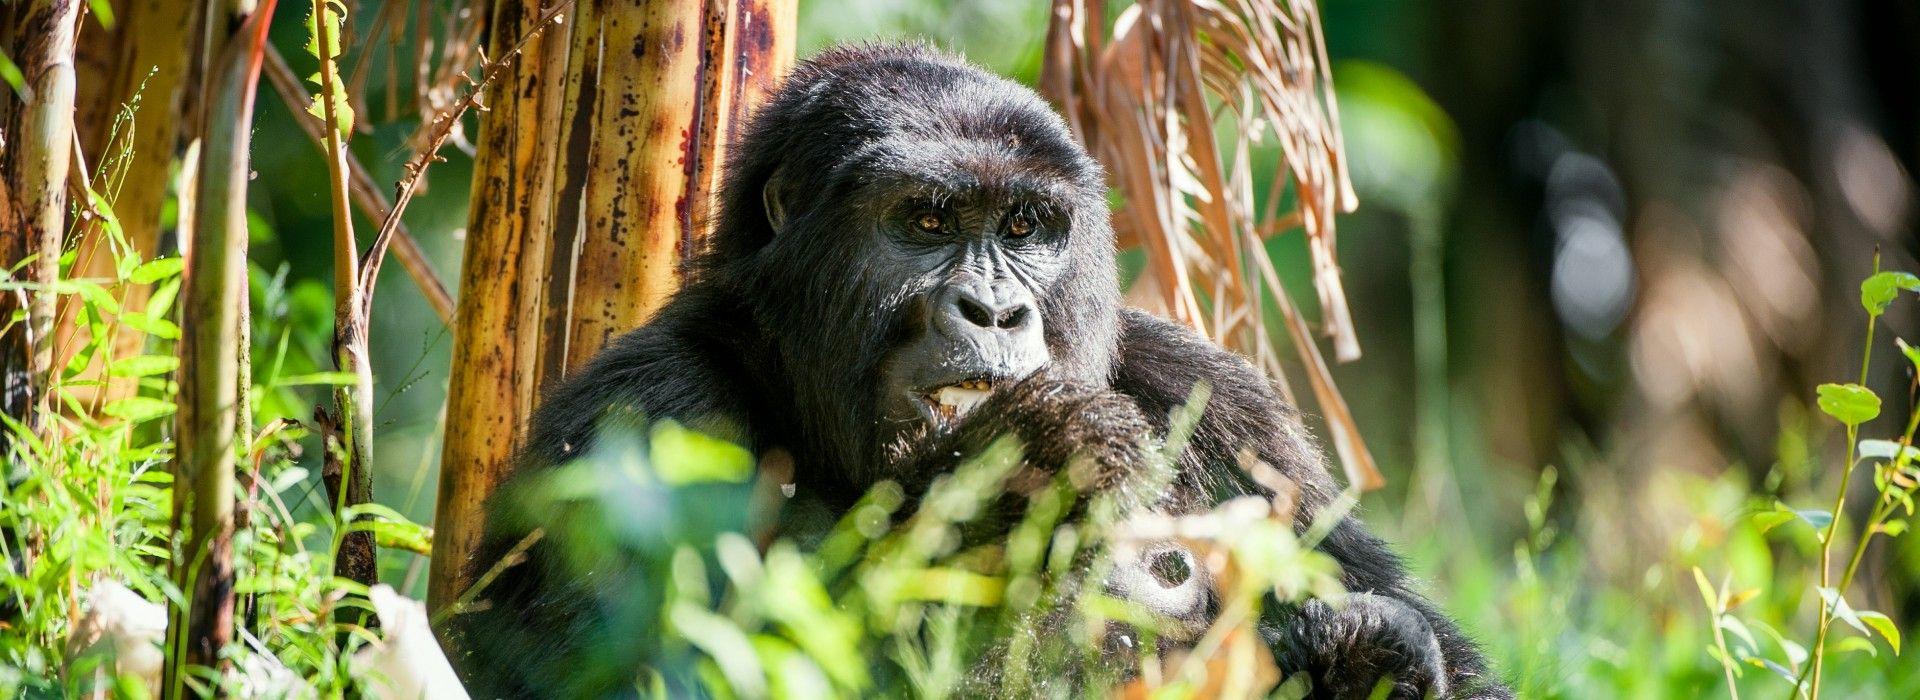 Trekking Tours in Uganda